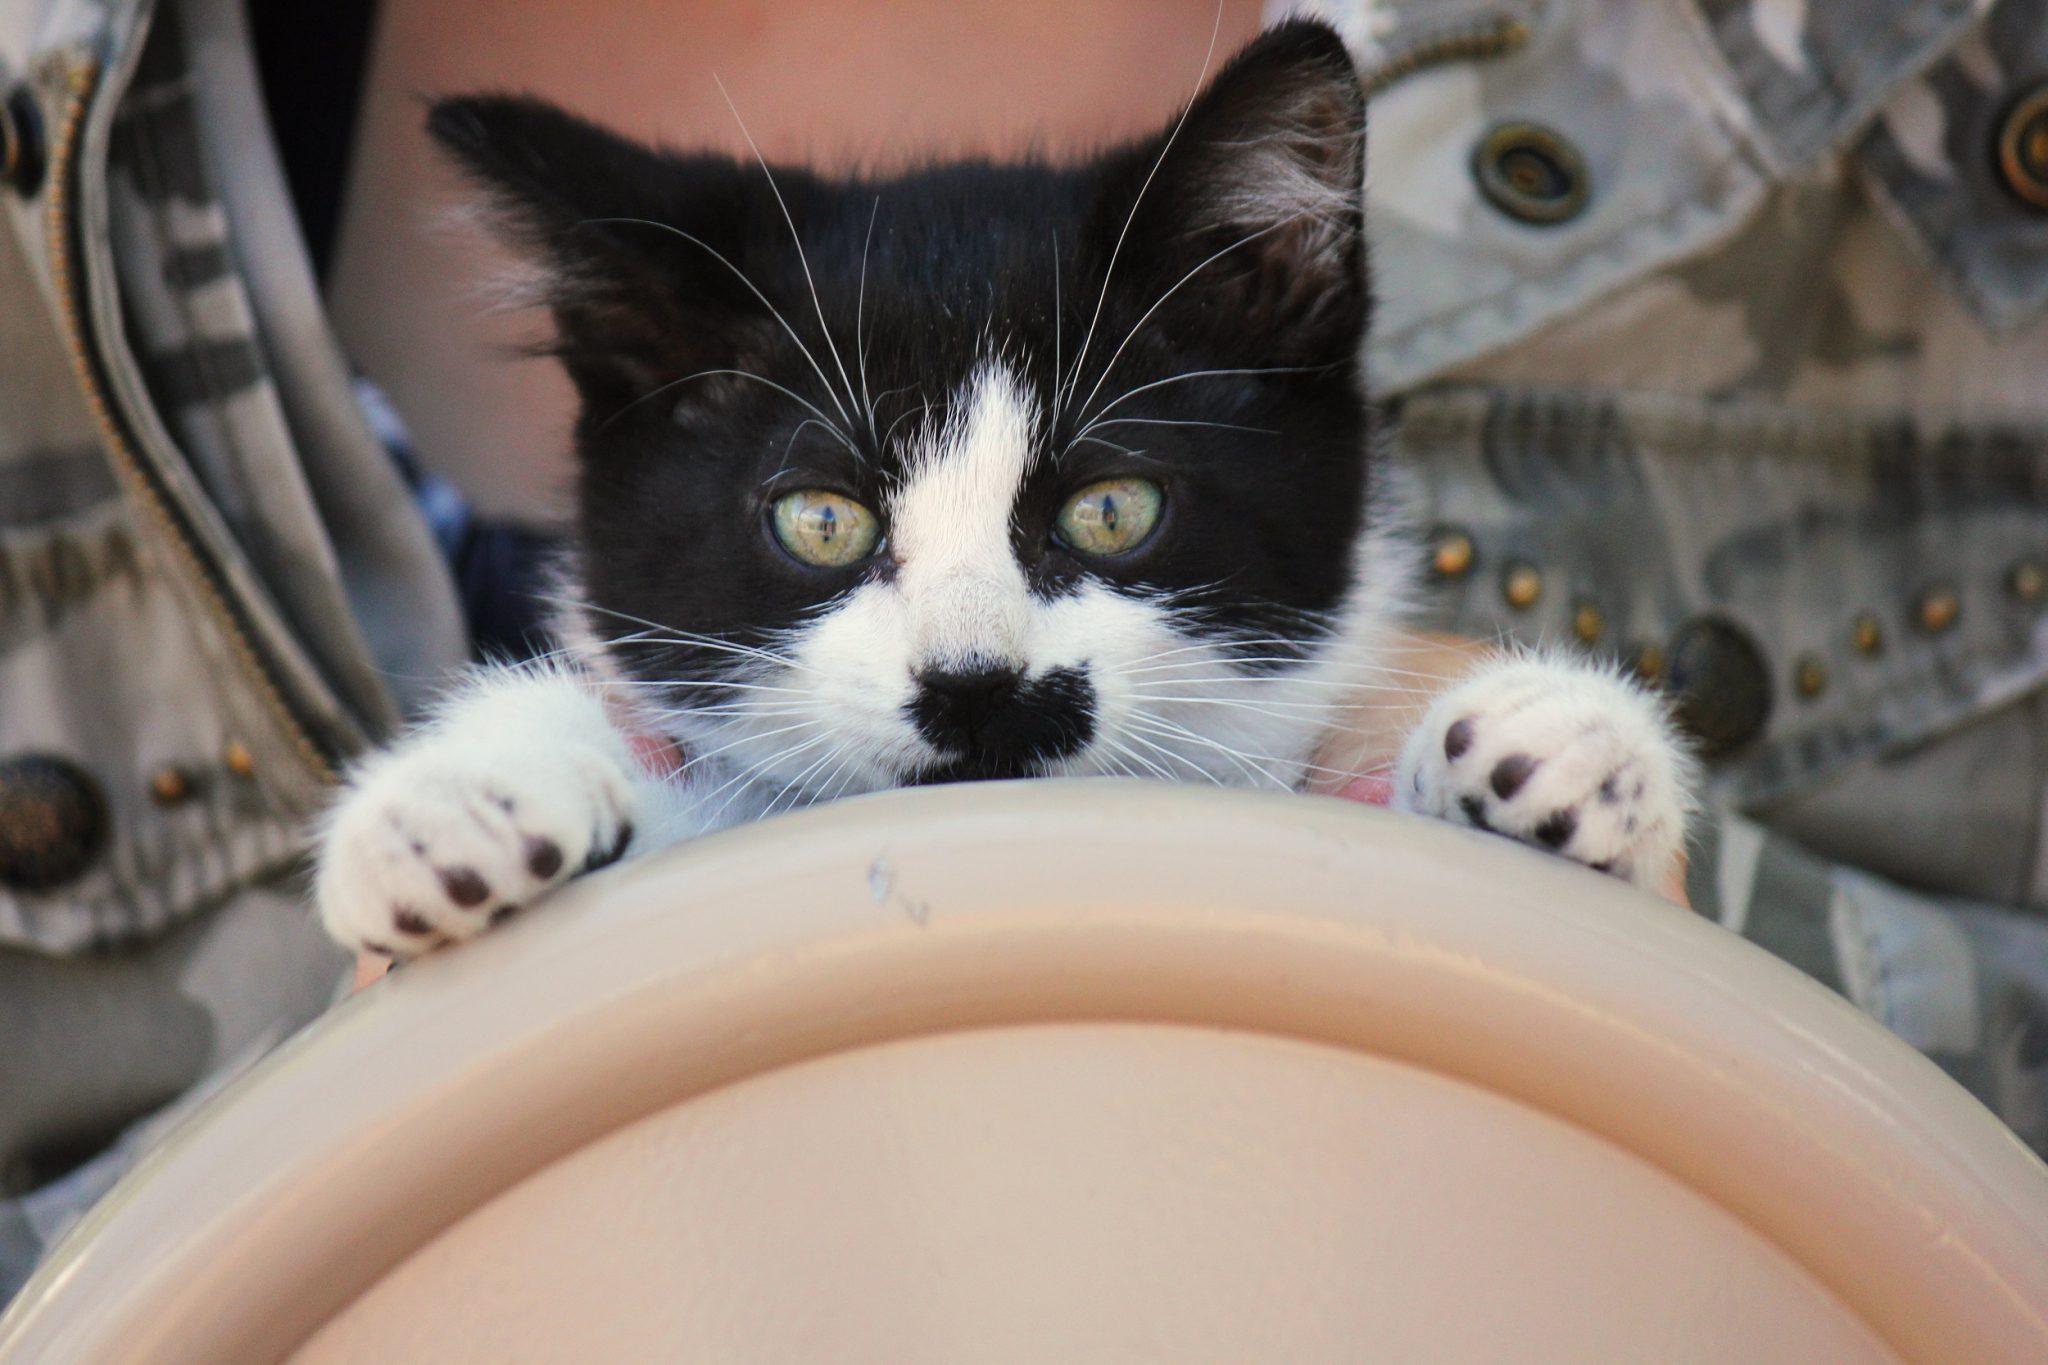 Sedating a cat with benadryl ingredients